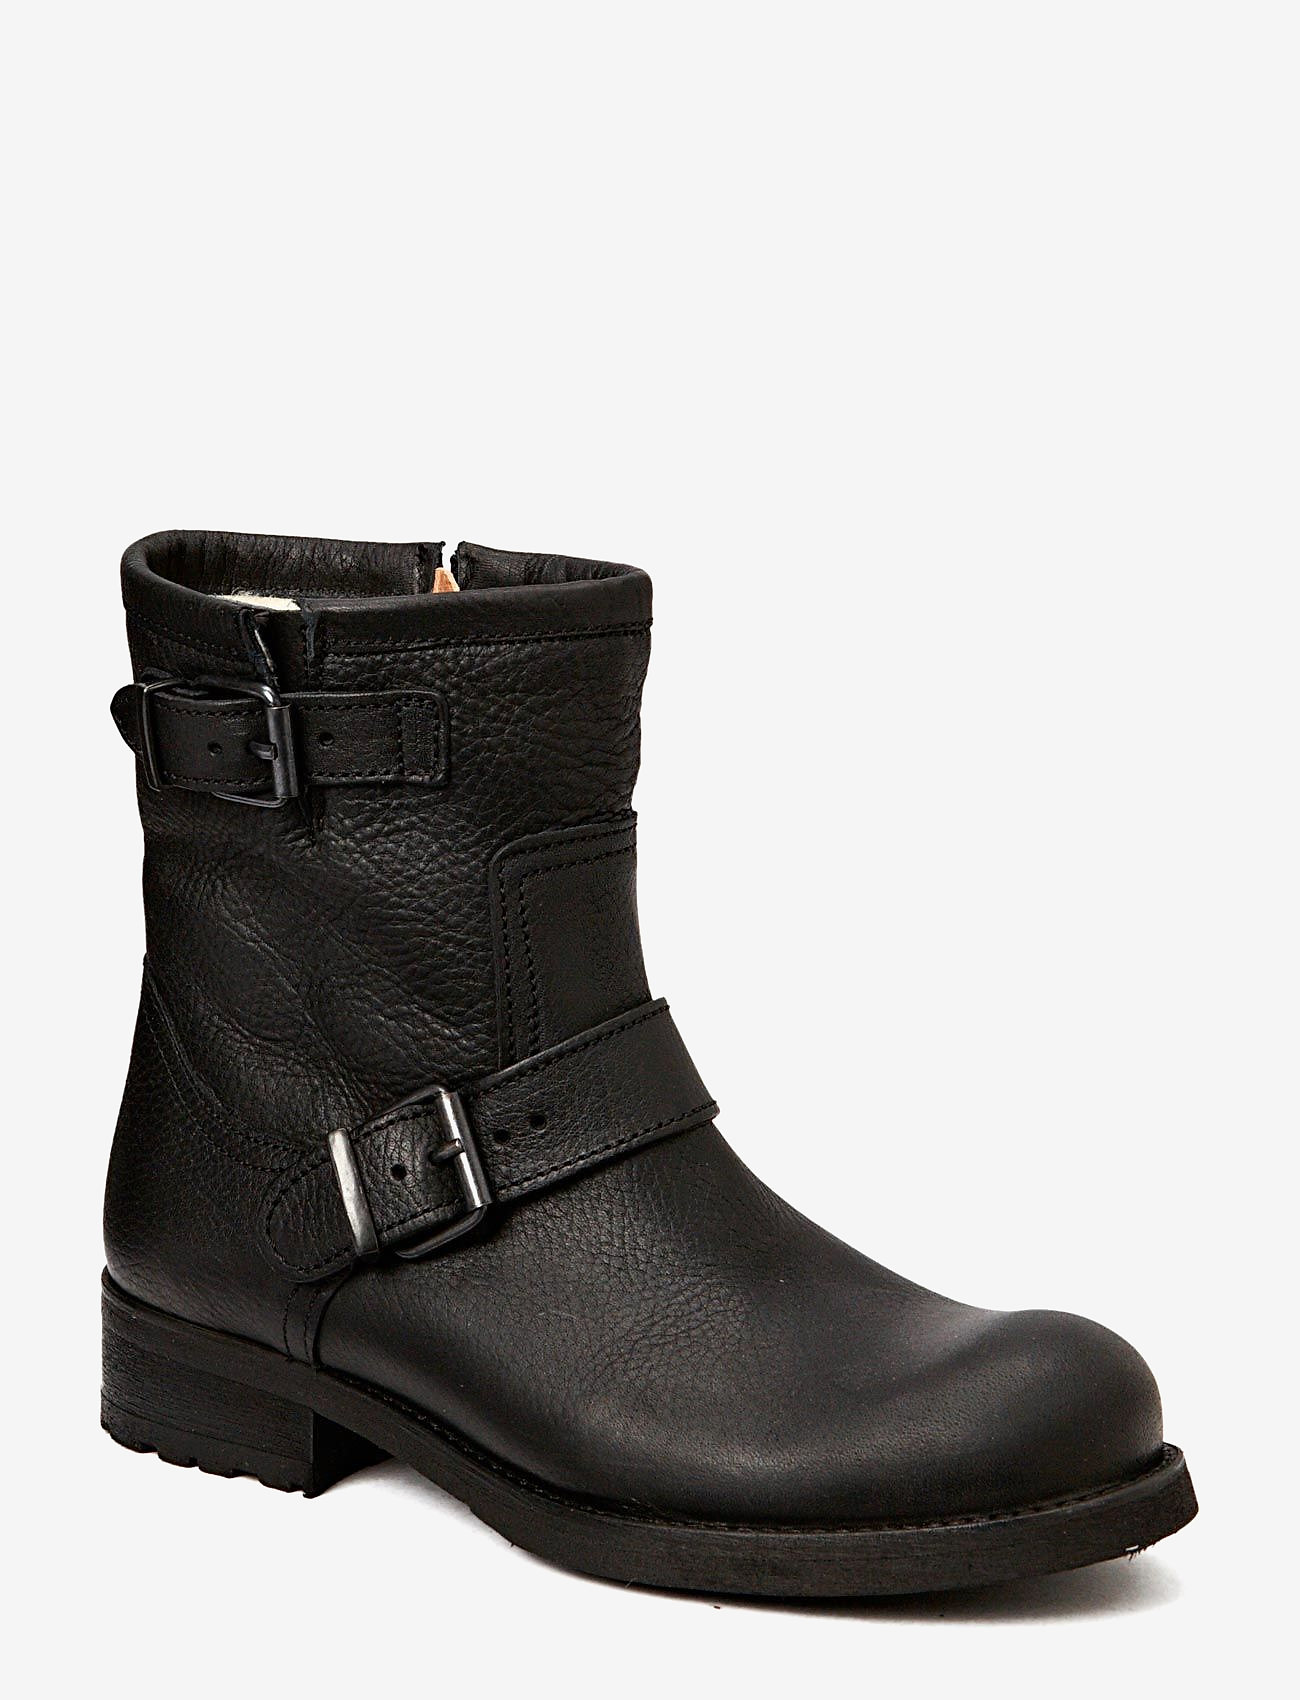 Billi Bi - BOOTS - WARM LINING - flate ankelstøvletter - black tomcat 80 - 0